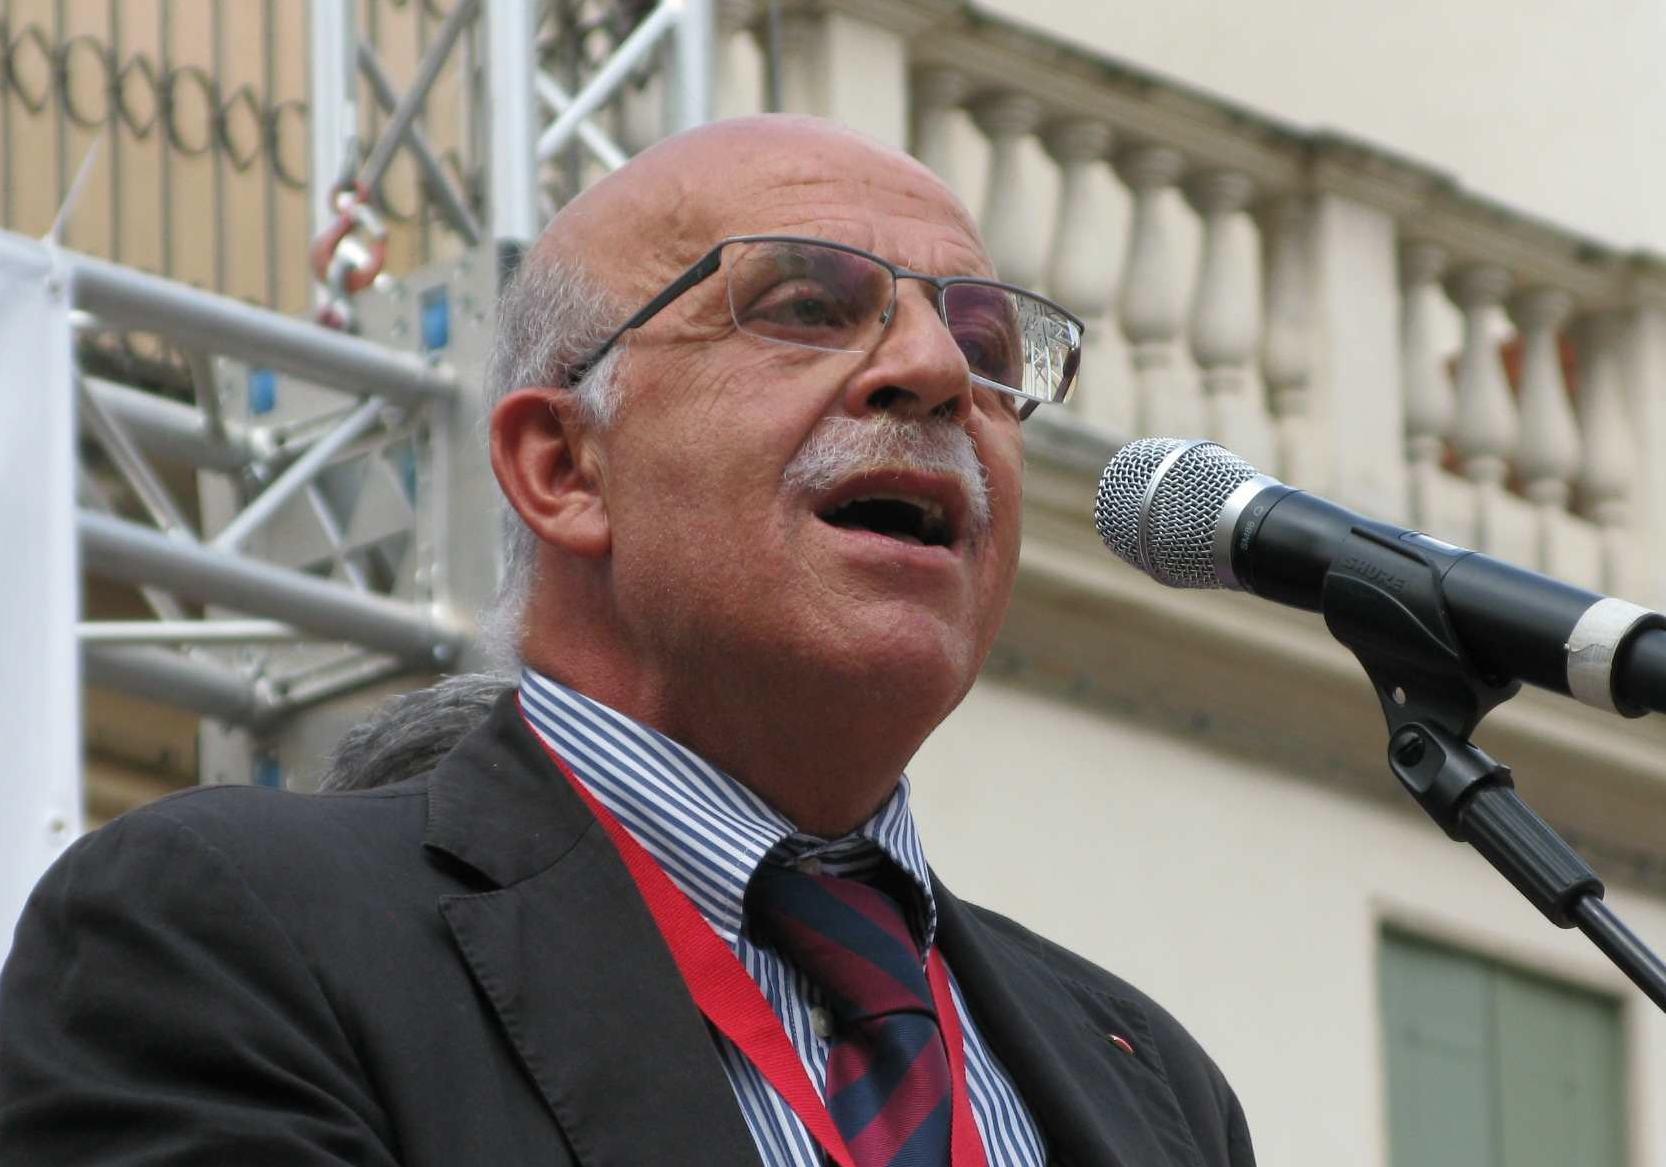 Emilio Viafora, segretario generale Filcams Cgil del Veneto